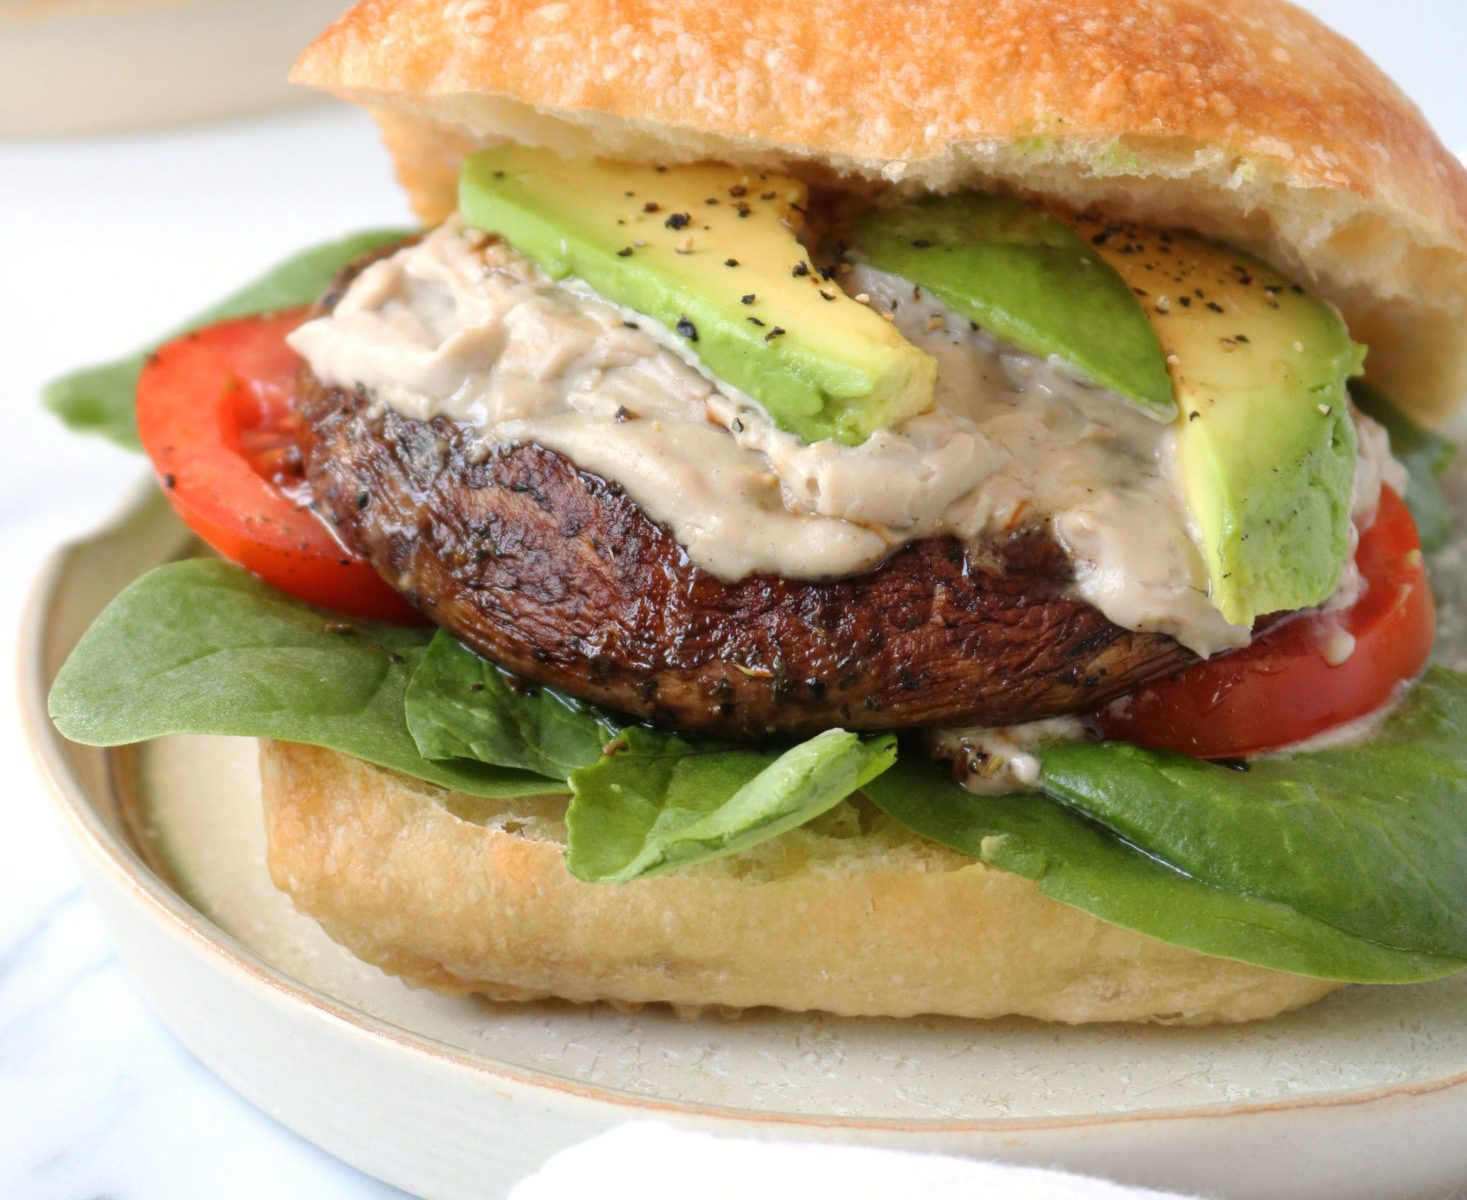 Grilled Vegan Portobello Mushroom Burger Recipe with Vegan Cheese